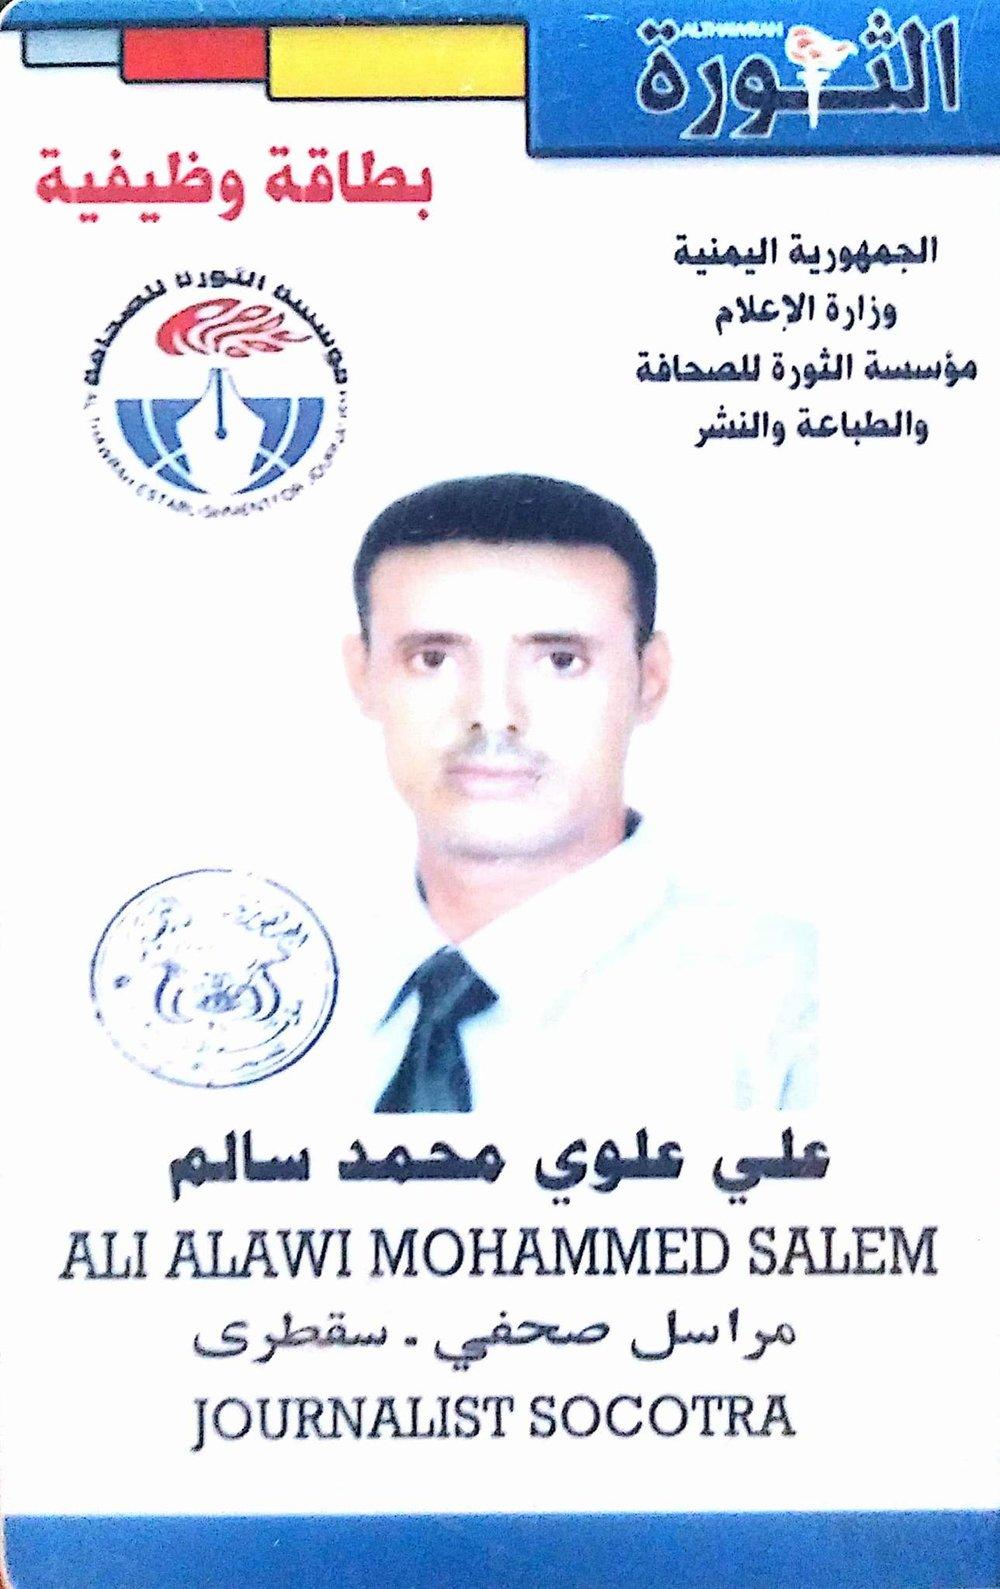 Ali Alawi Mohammed Salem Journalist Socotra.jpg